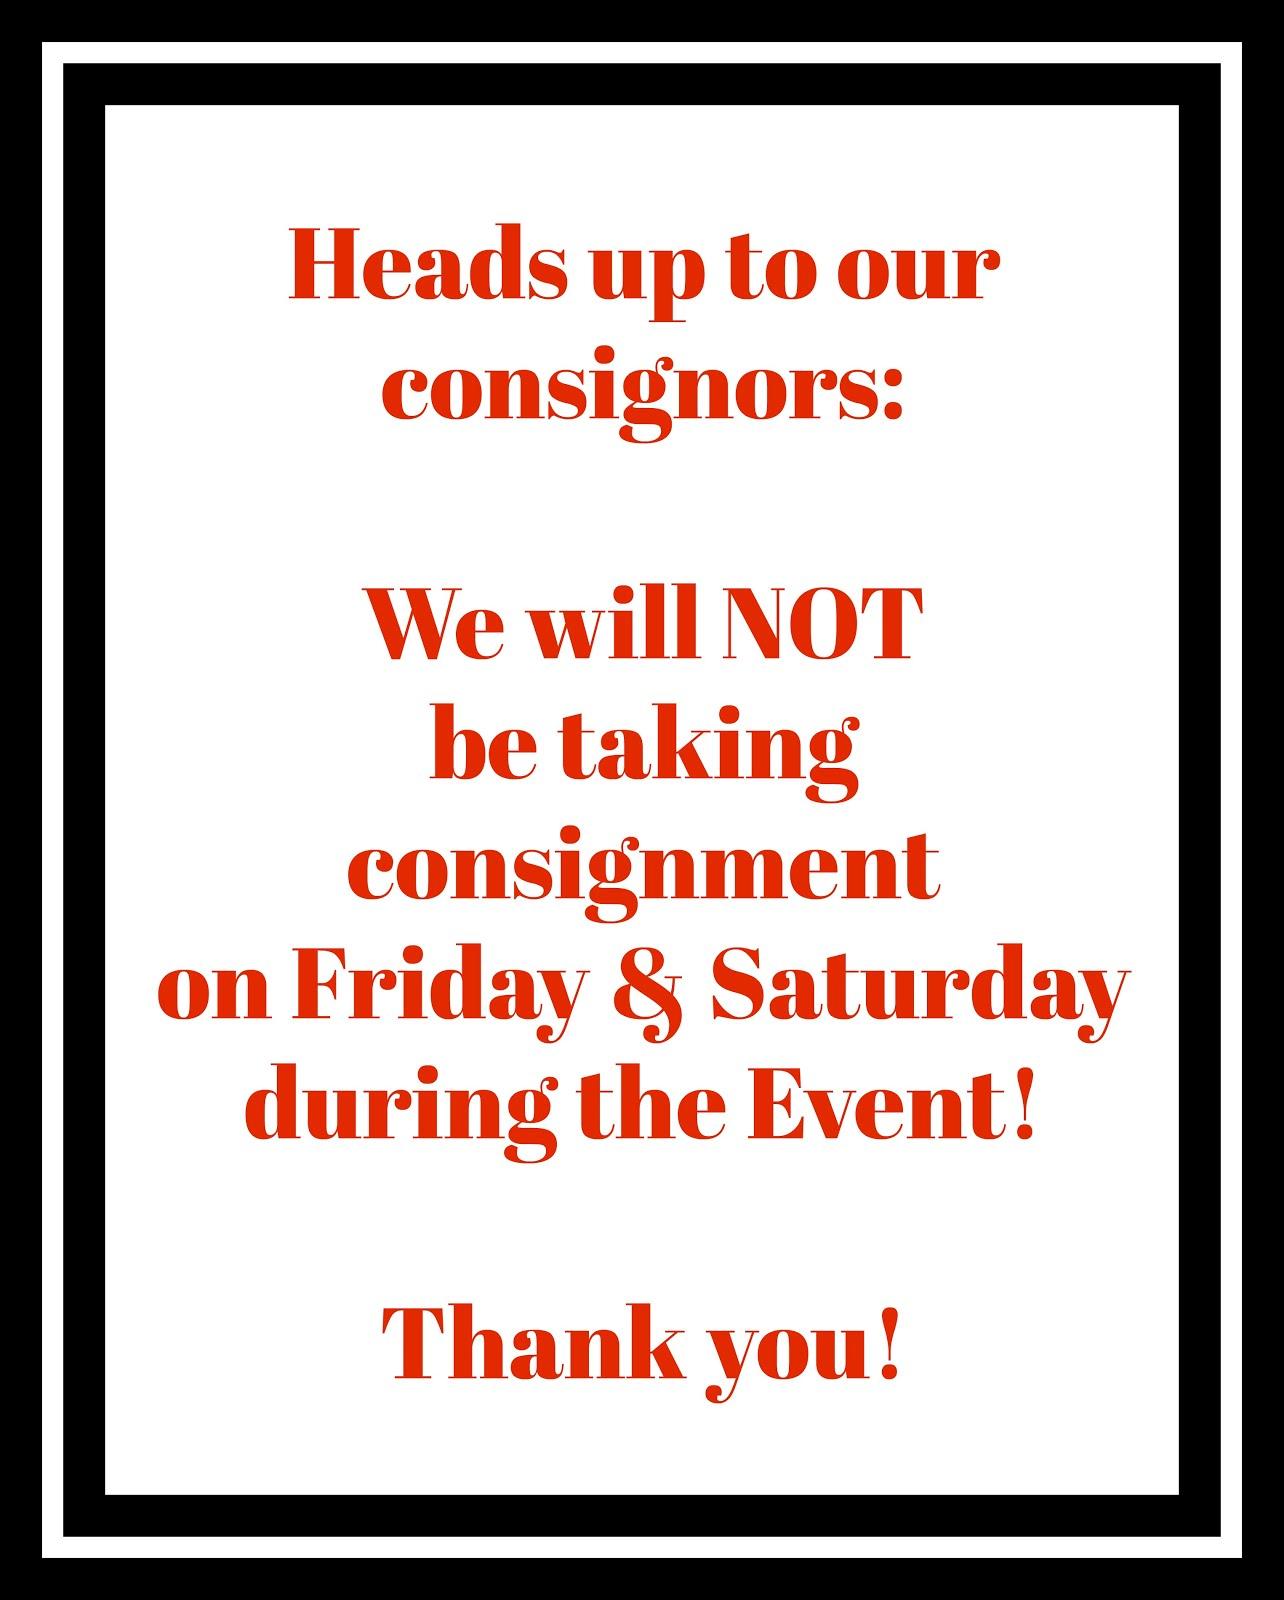 Dear Consignors!